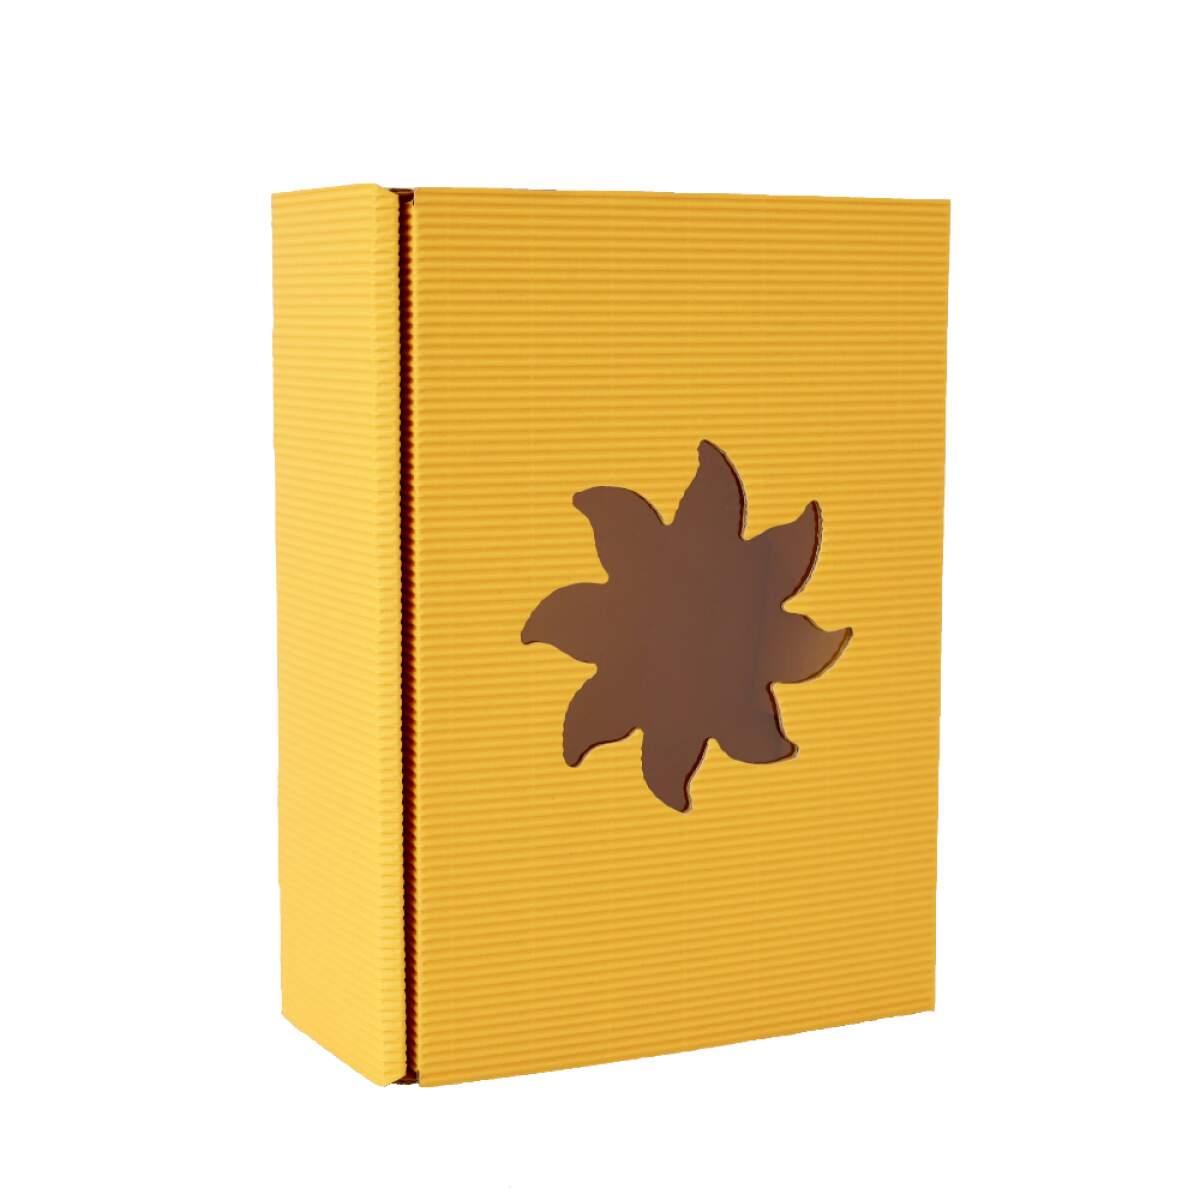 Box-Gr-M-Sonne-gelb_2099_1000px